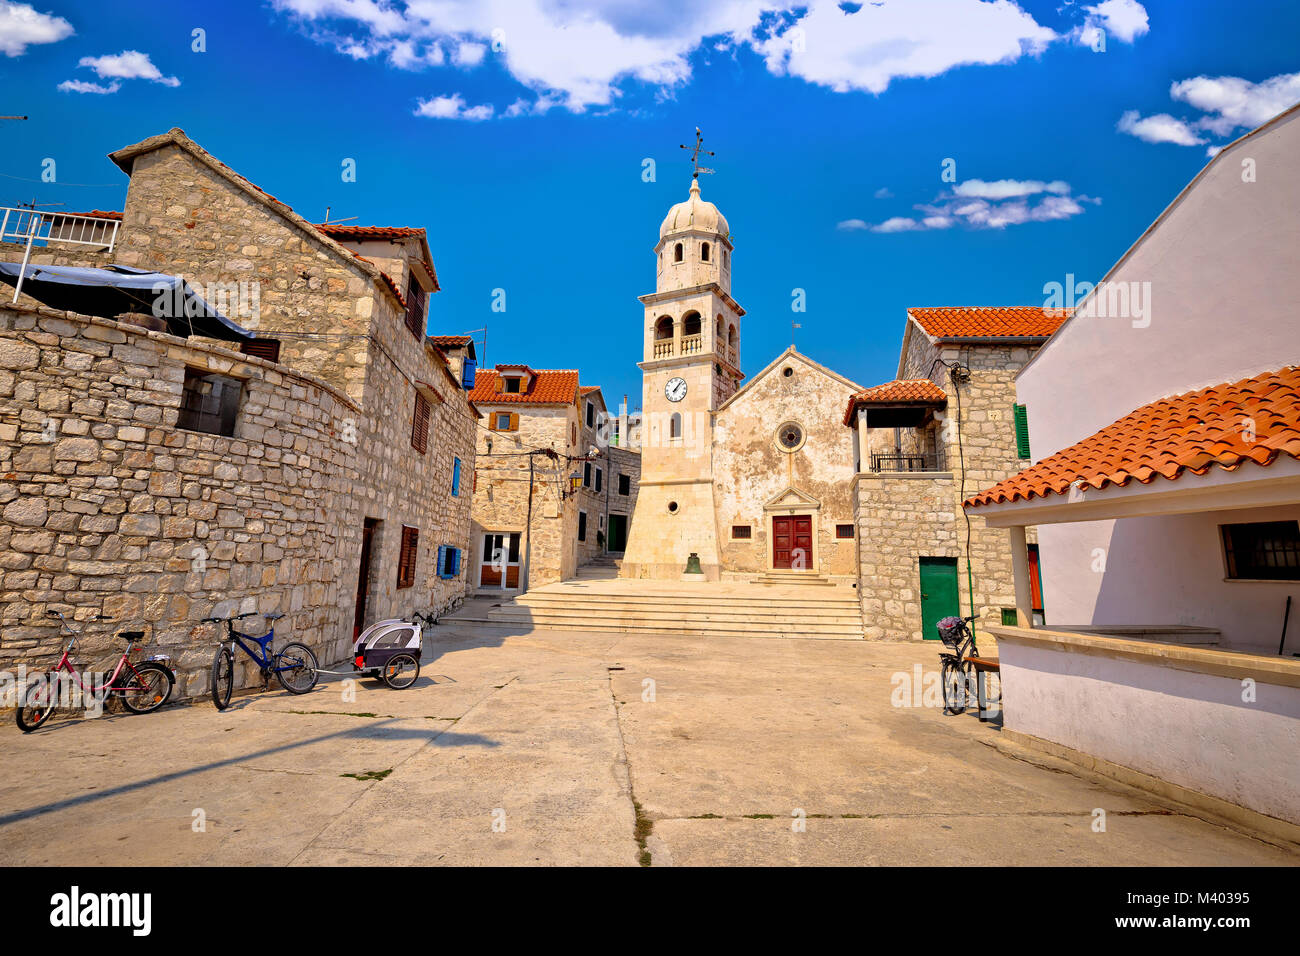 Prvic Sepurine stone architecture view, Sibenik archipelago of Croatia - Stock Image